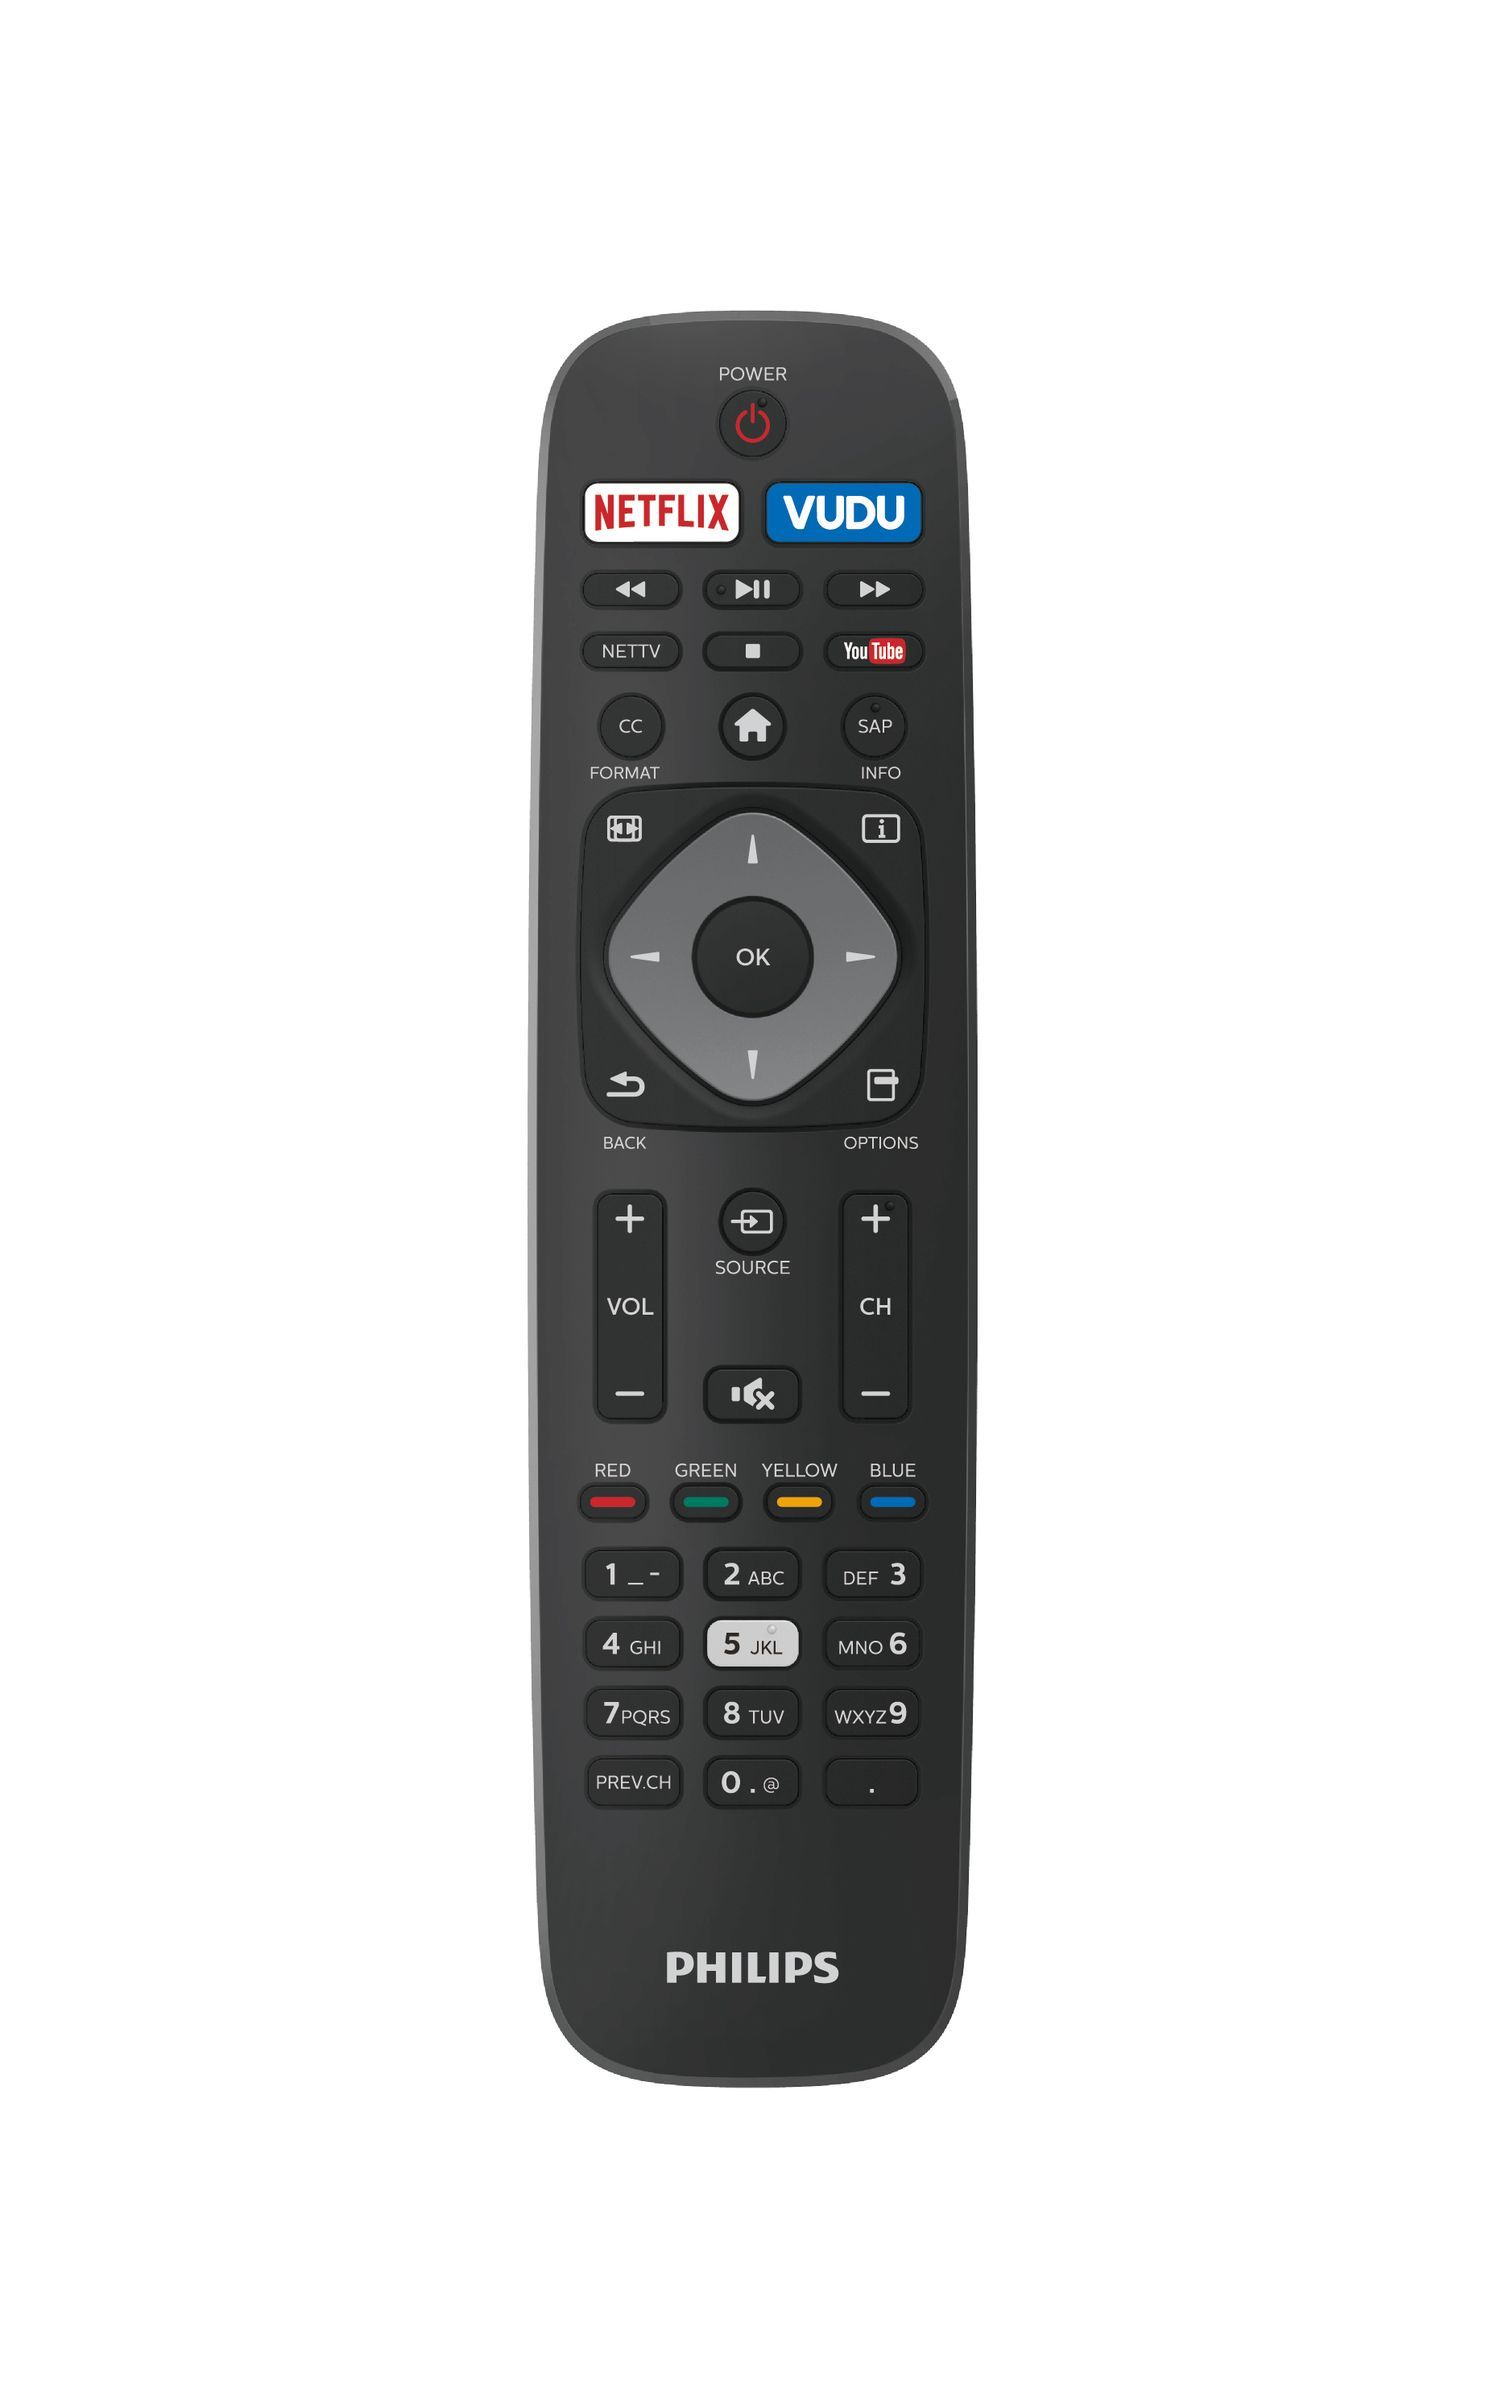 Specs Philips 5000 series 55PFL5602/F7 LED TV 139.7 cm (55